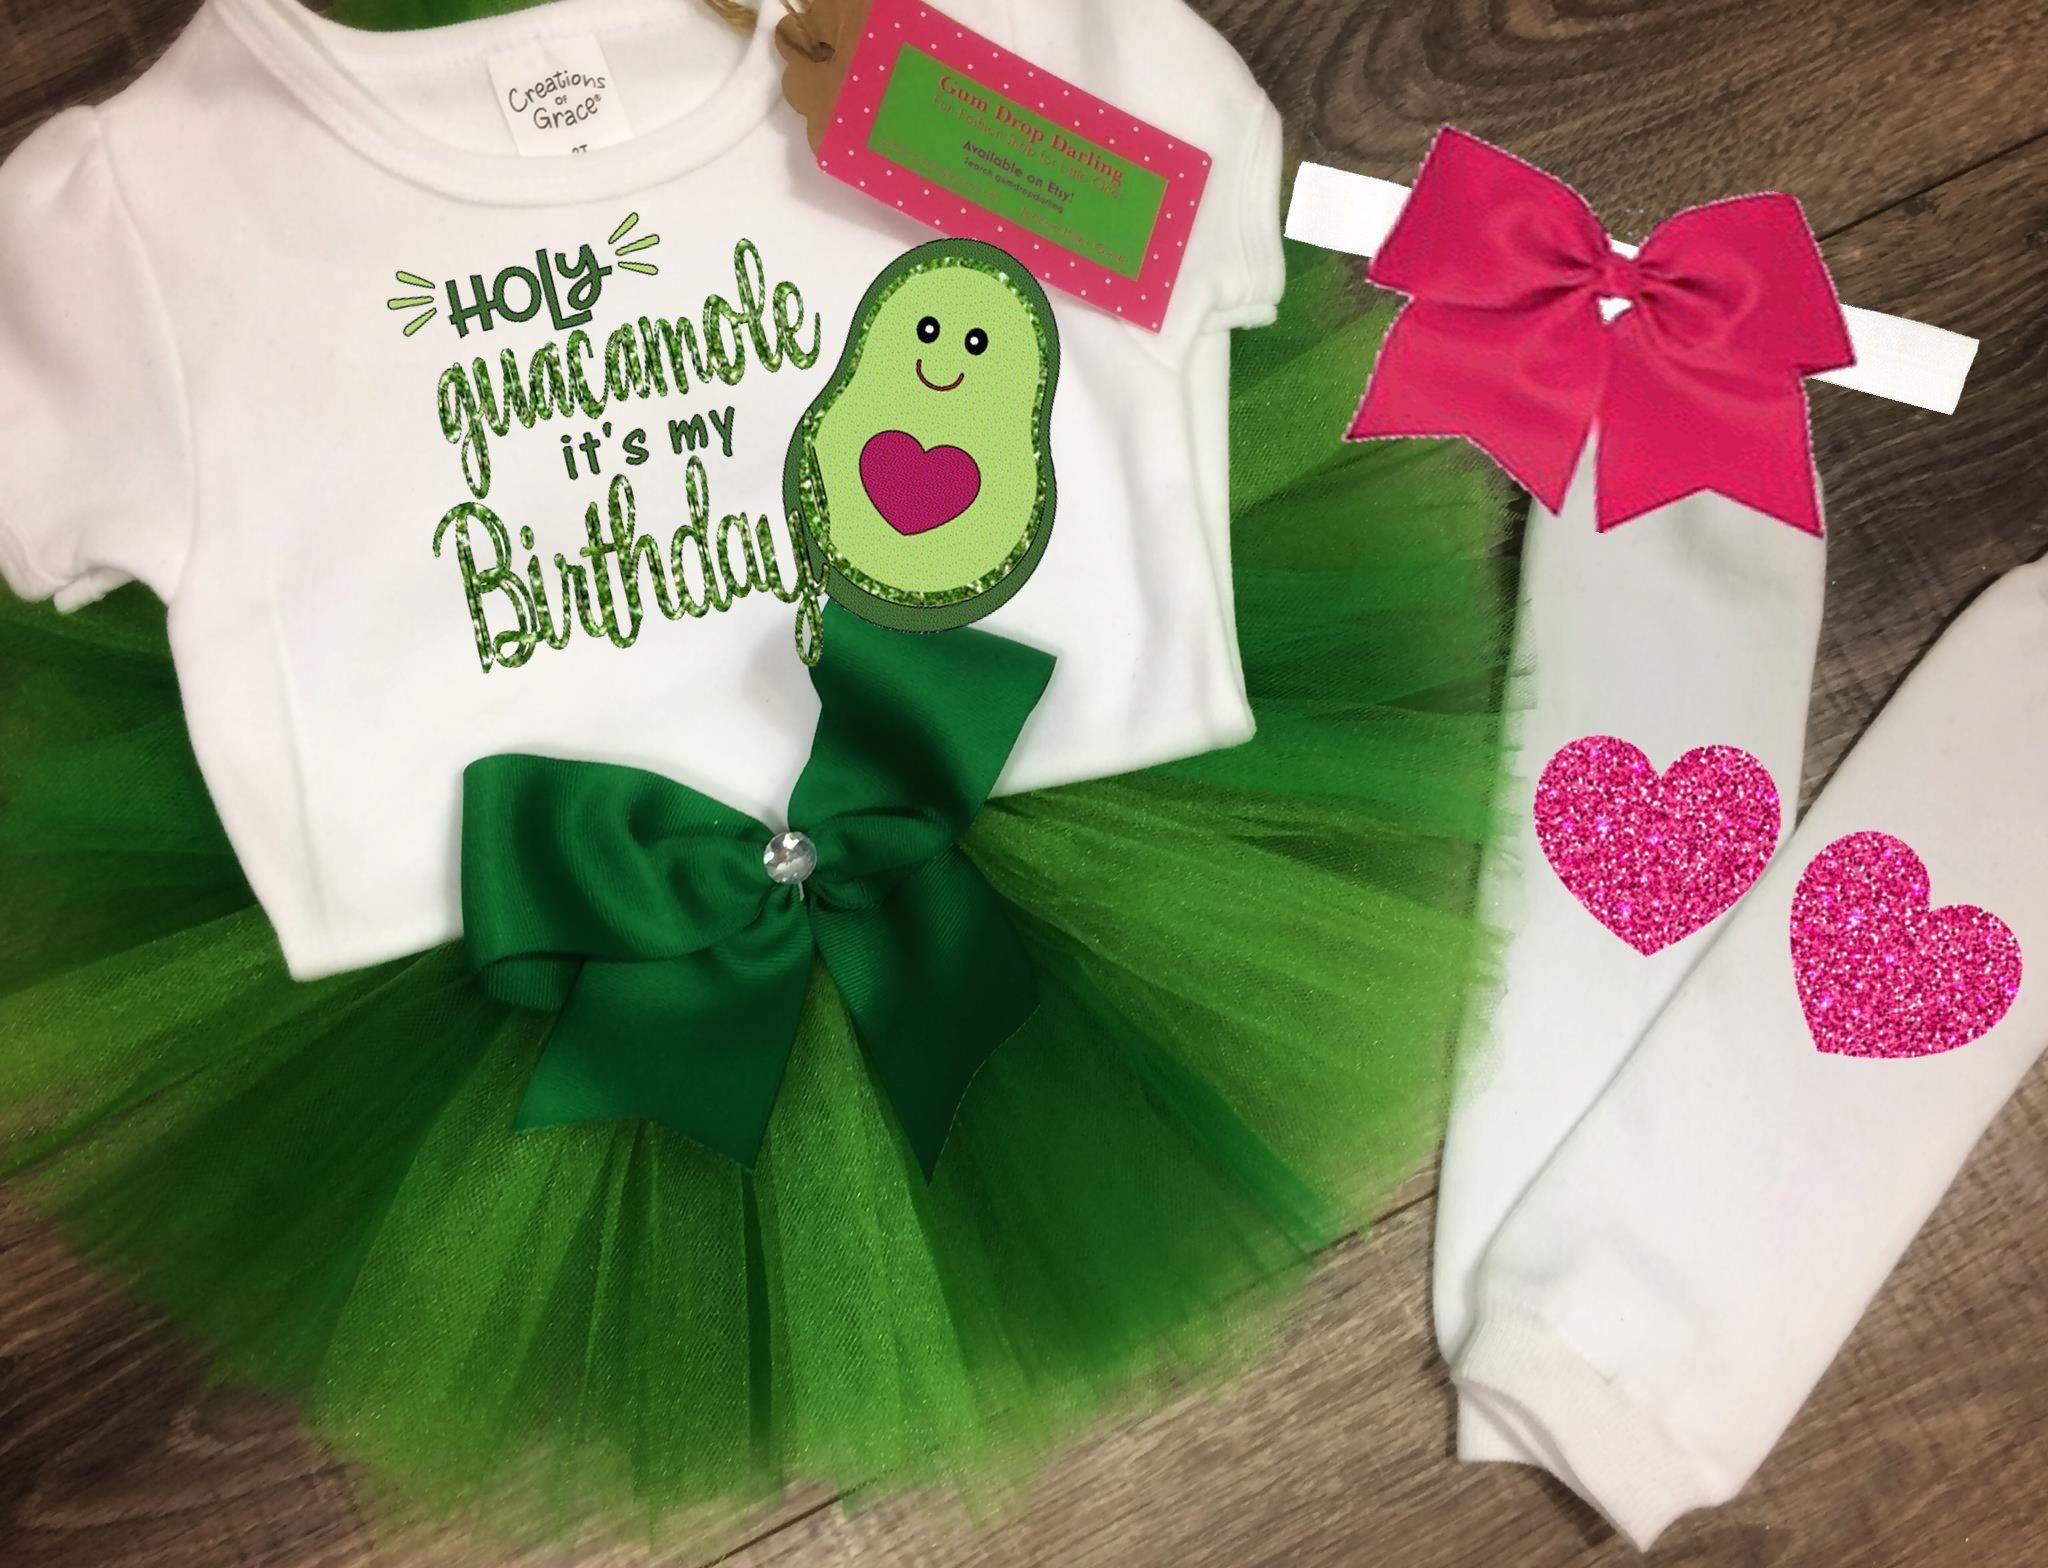 1f7fd579aee86 Birthday tutu, Avocado shirt, Birthday Top, Birthday tutu outfit, holy  guacamole, avocado outfit, green tutu, bow headband, heart leggings by  GumDropDarling ...